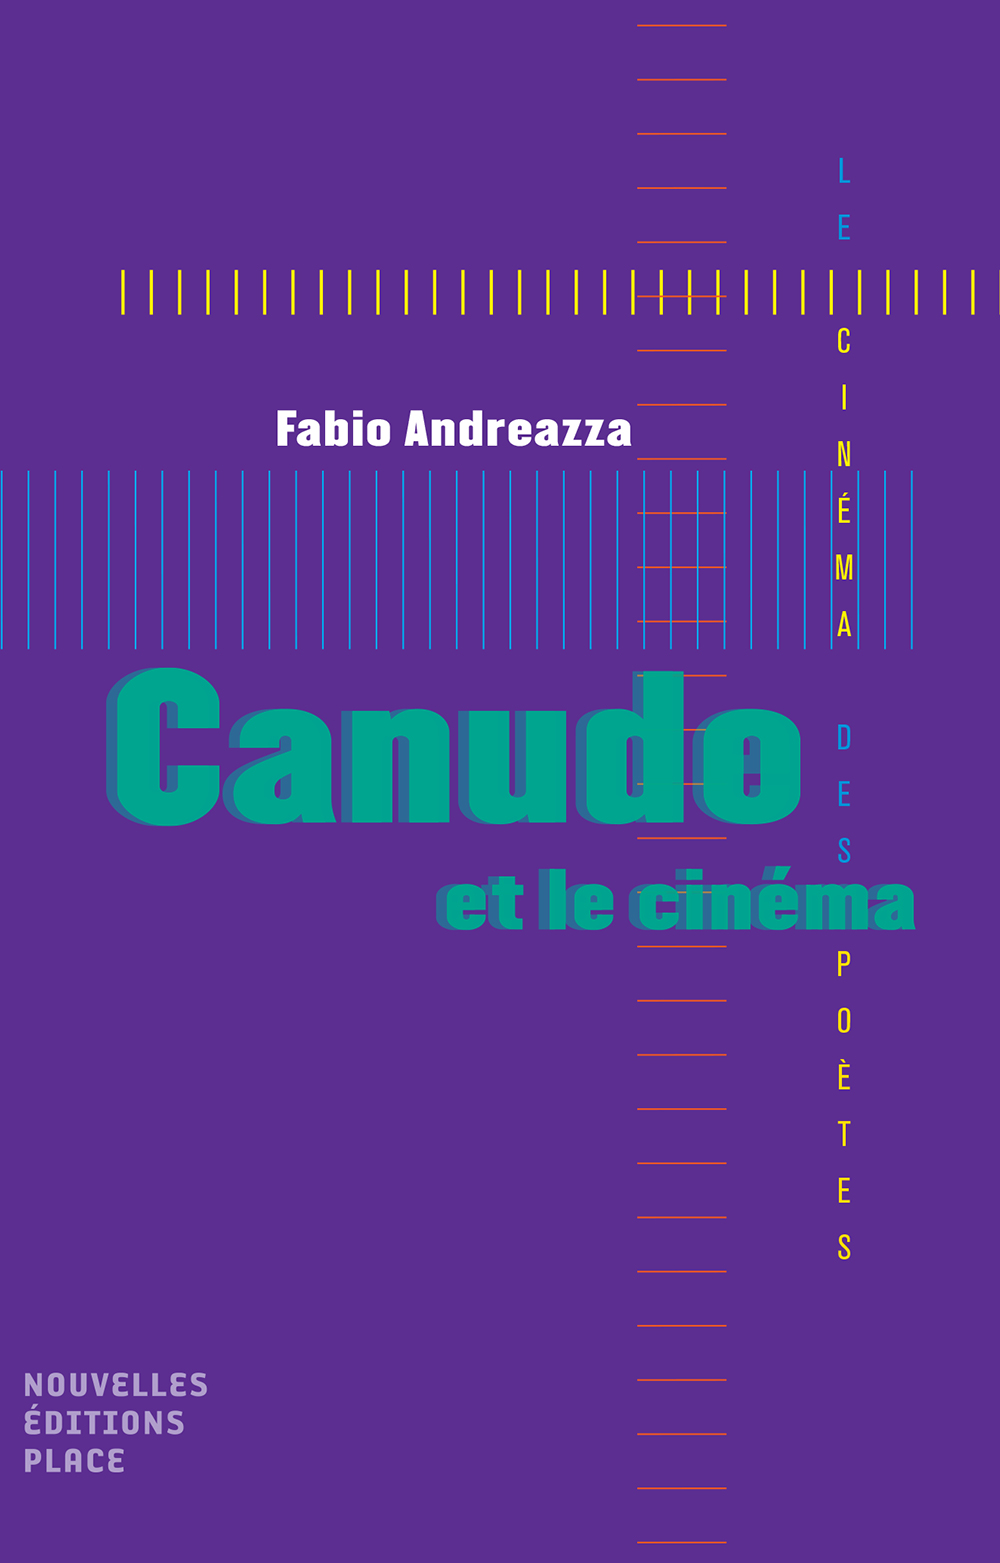 F. Andreazza, Canudo et le cinéma